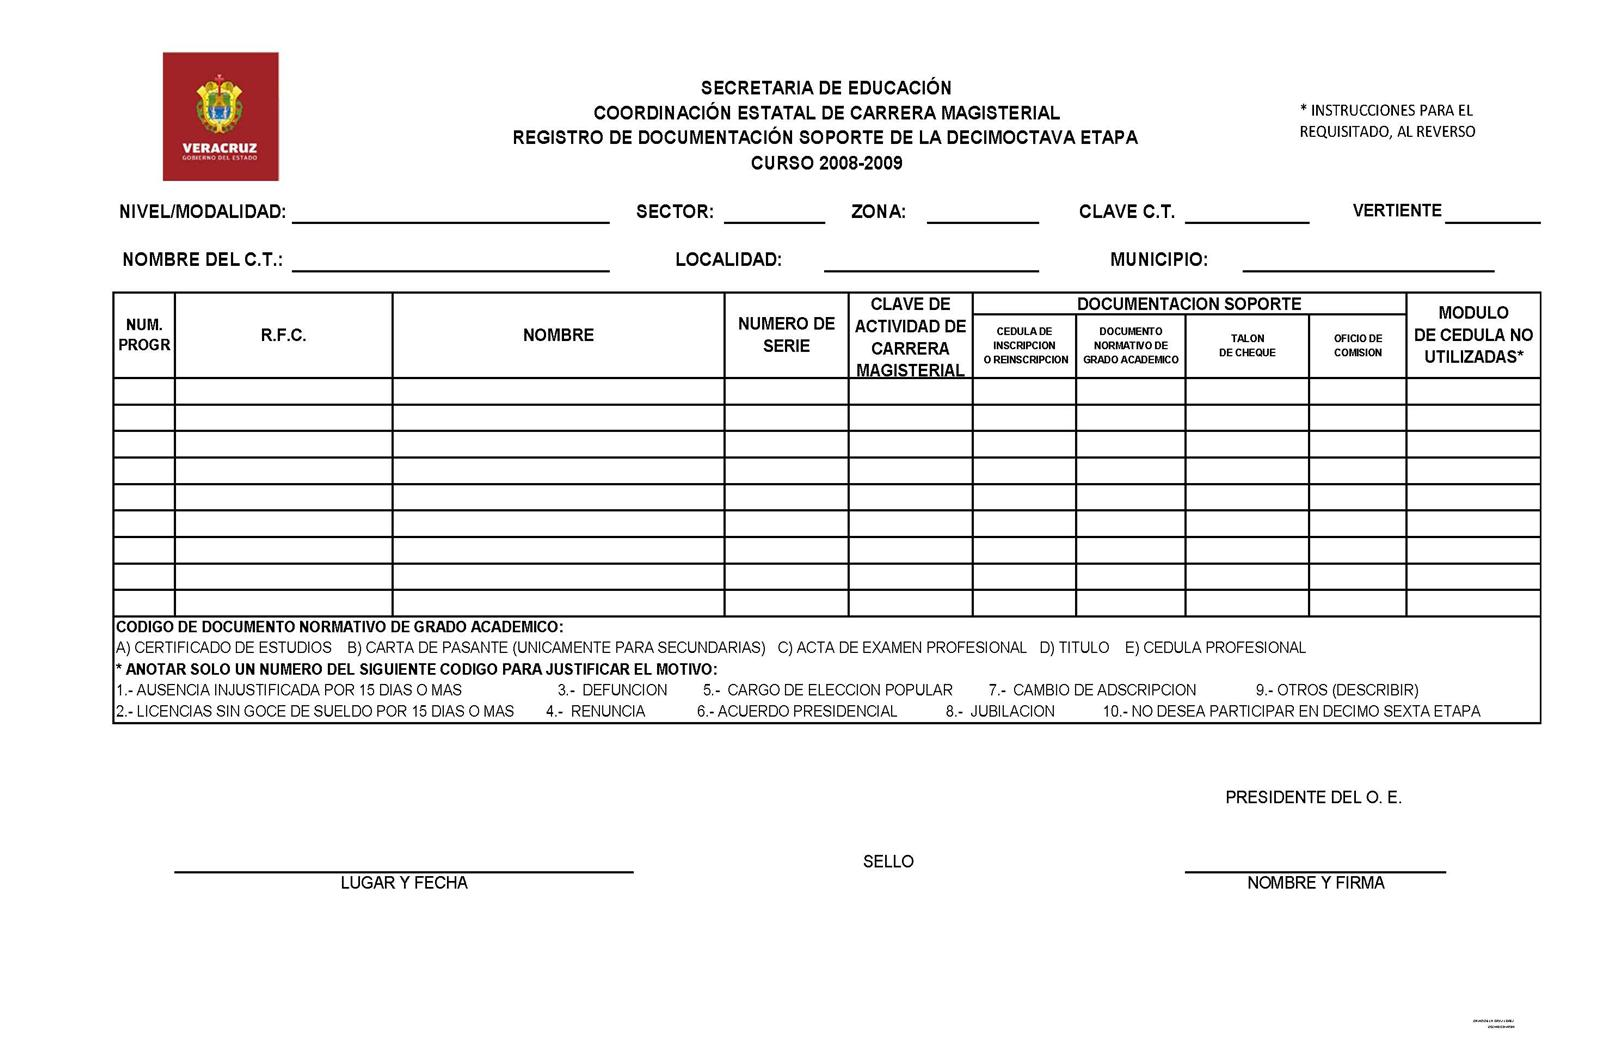 Inscripciones Primaria Secundaria Preescolar Sep Df | Share The ...